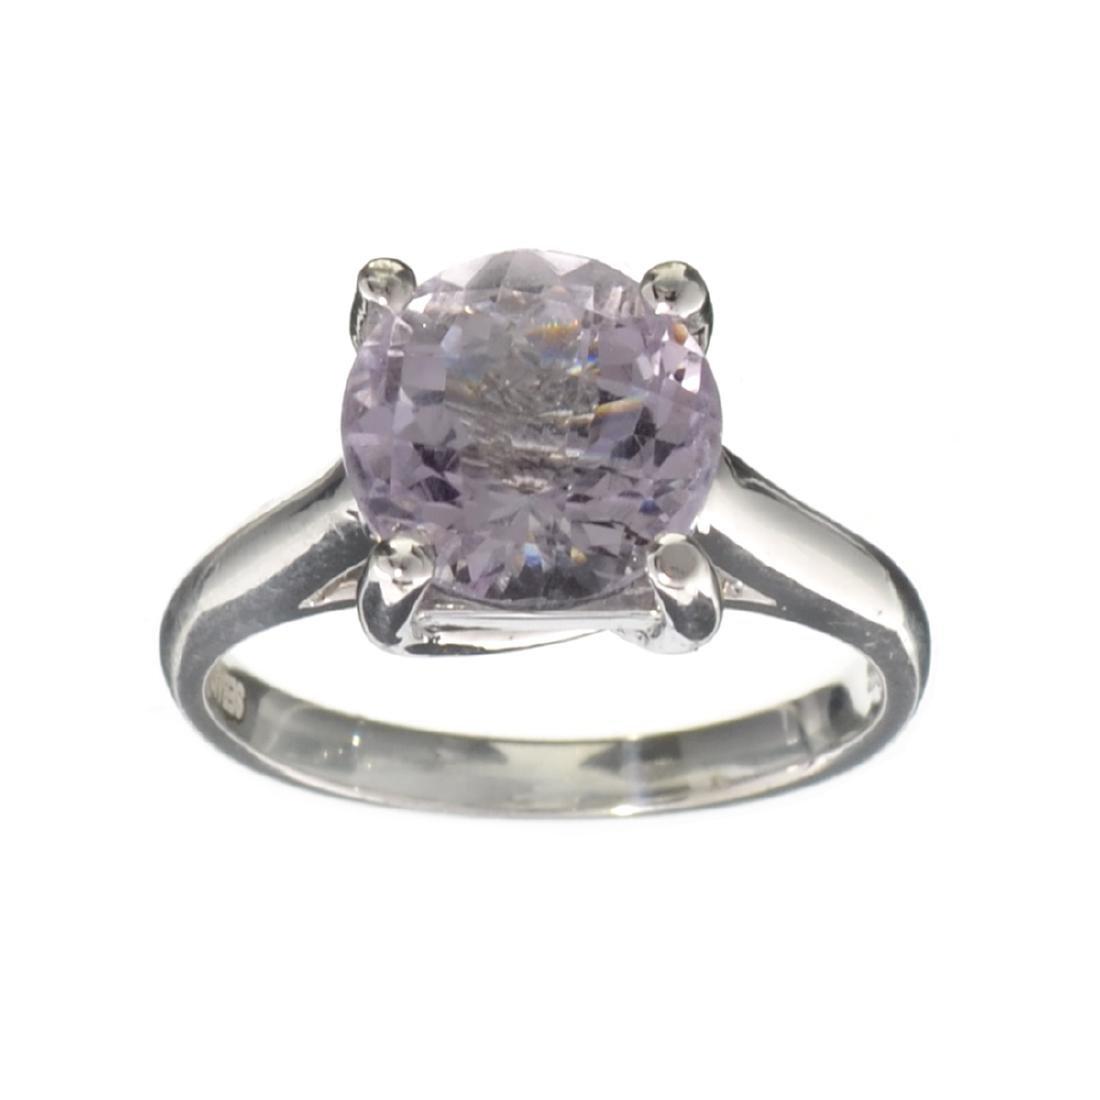 APP: 0.5k Fine Jewelry Designer Sebastian, 2.28CT Round